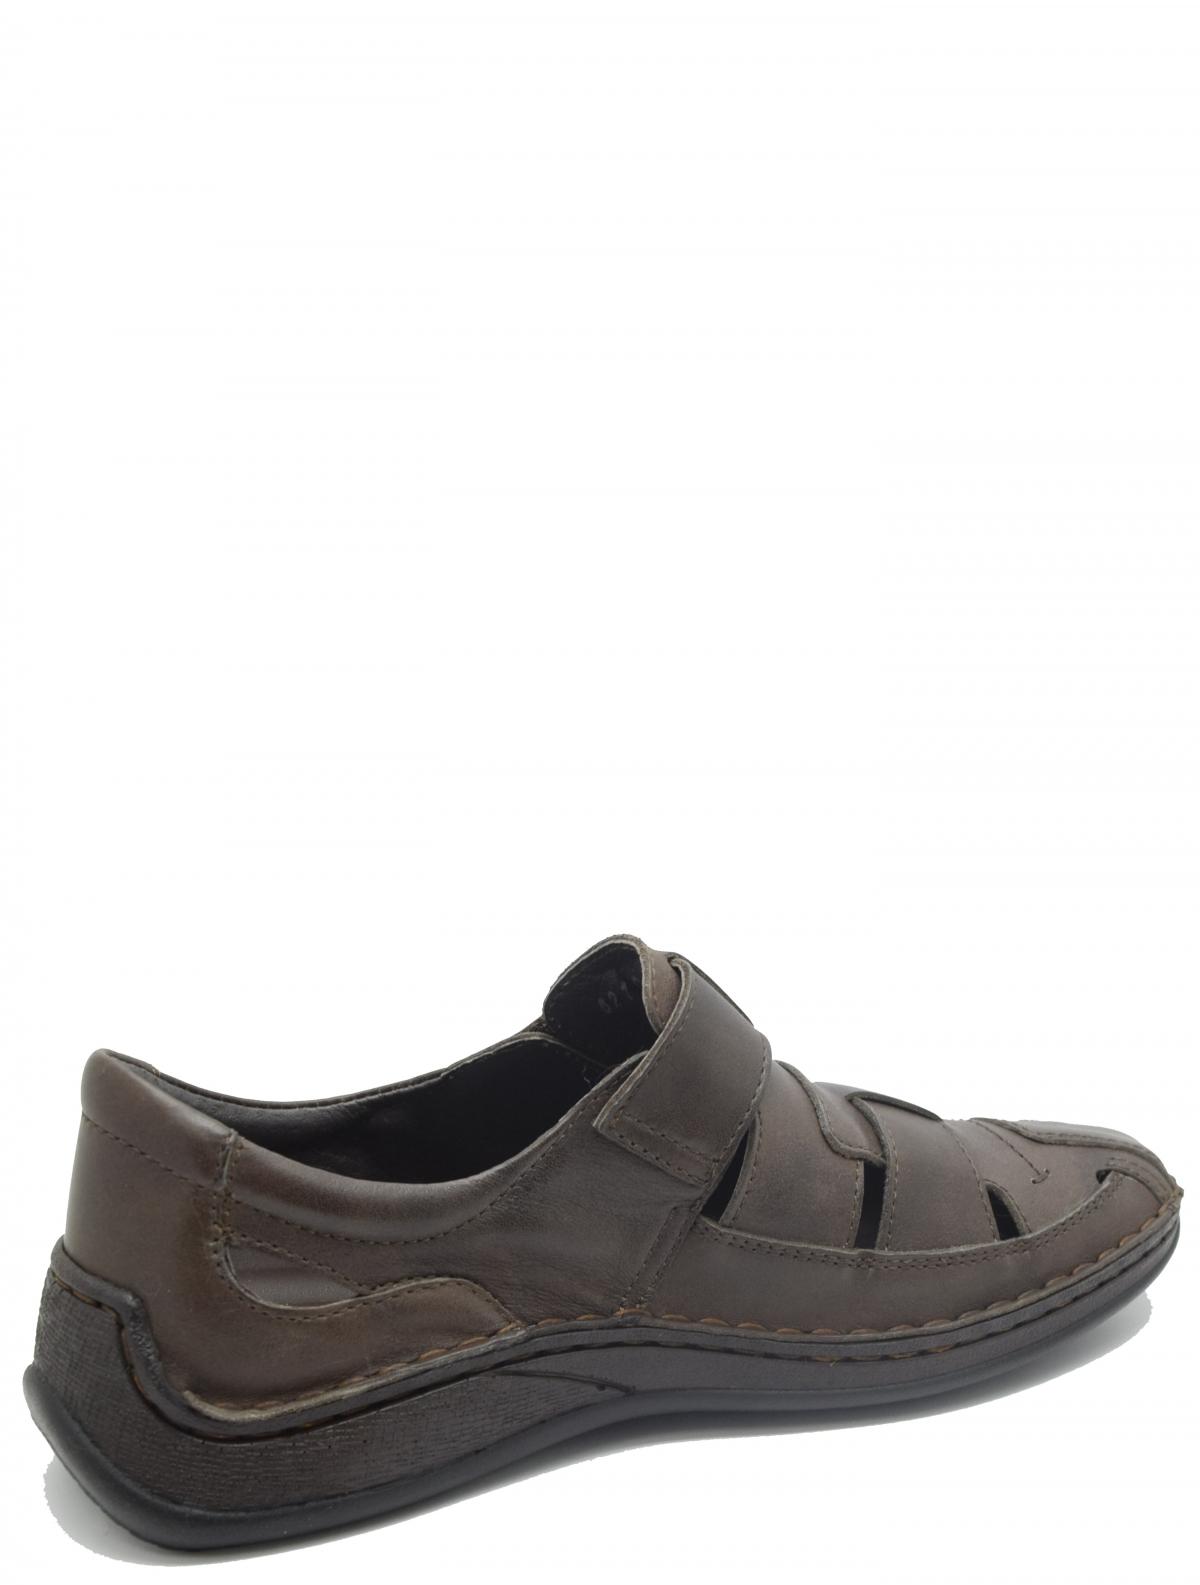 EDERRO 621046120 мужские сандали